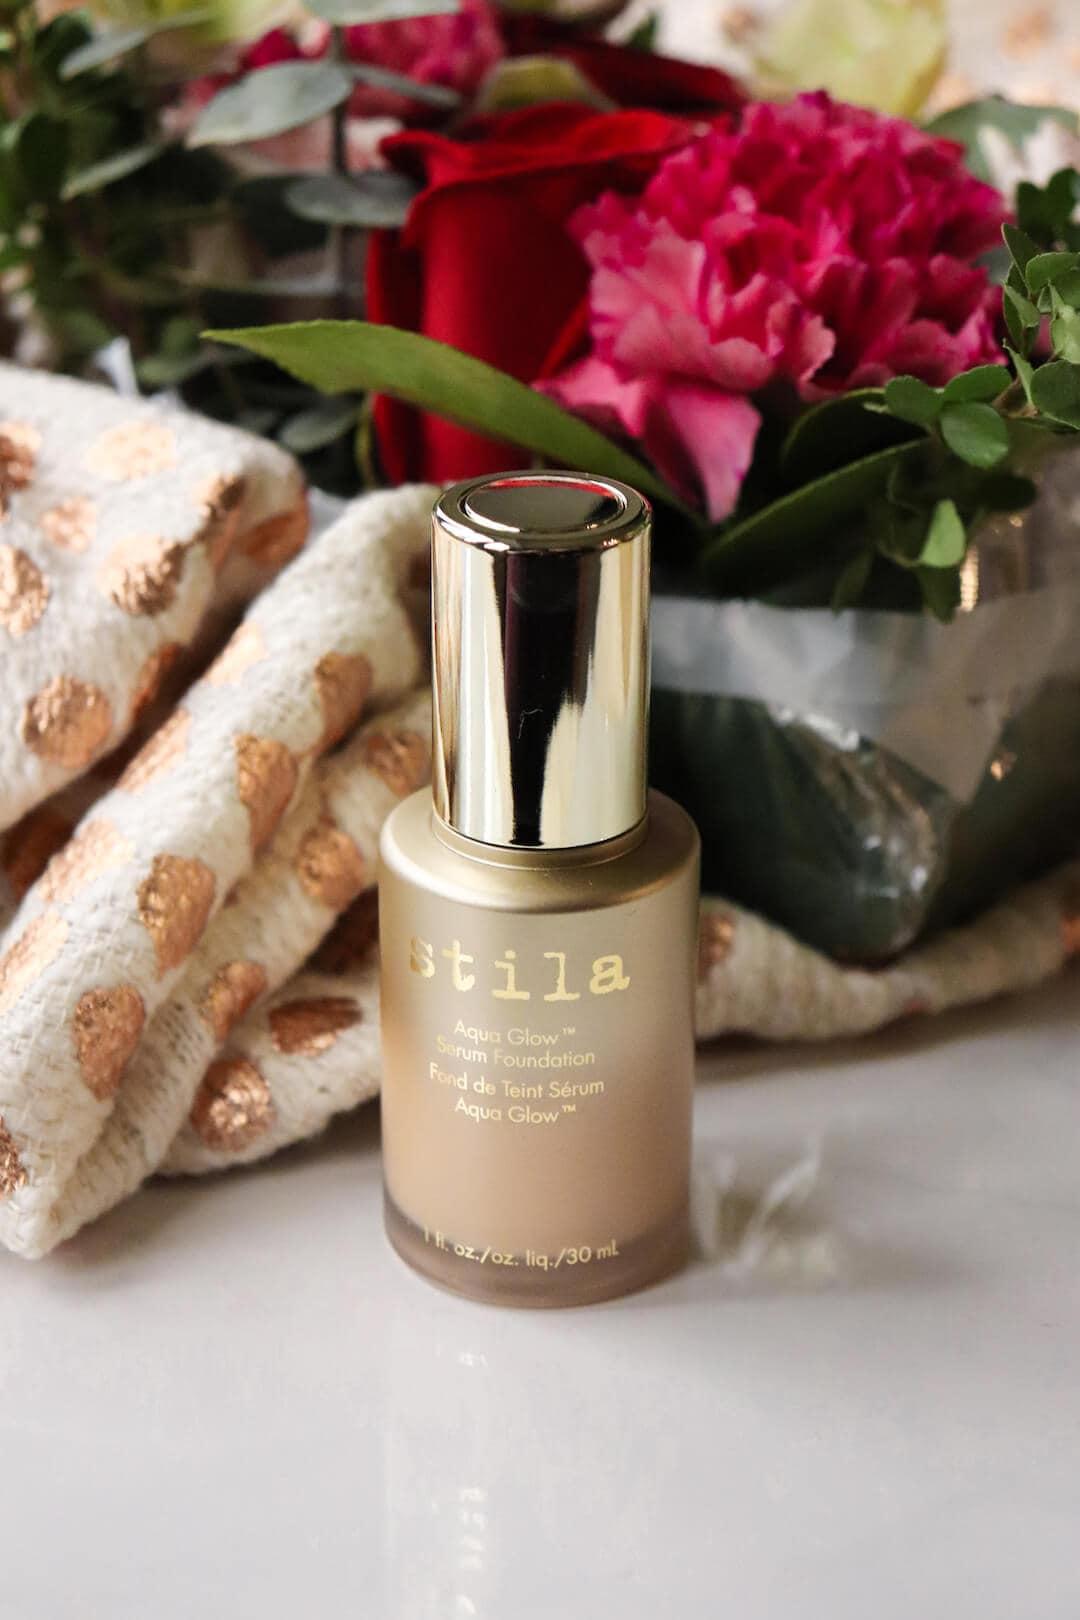 Beauty Bridge Haul   Stila Cosmetics & Smashbox Cosmetics Review